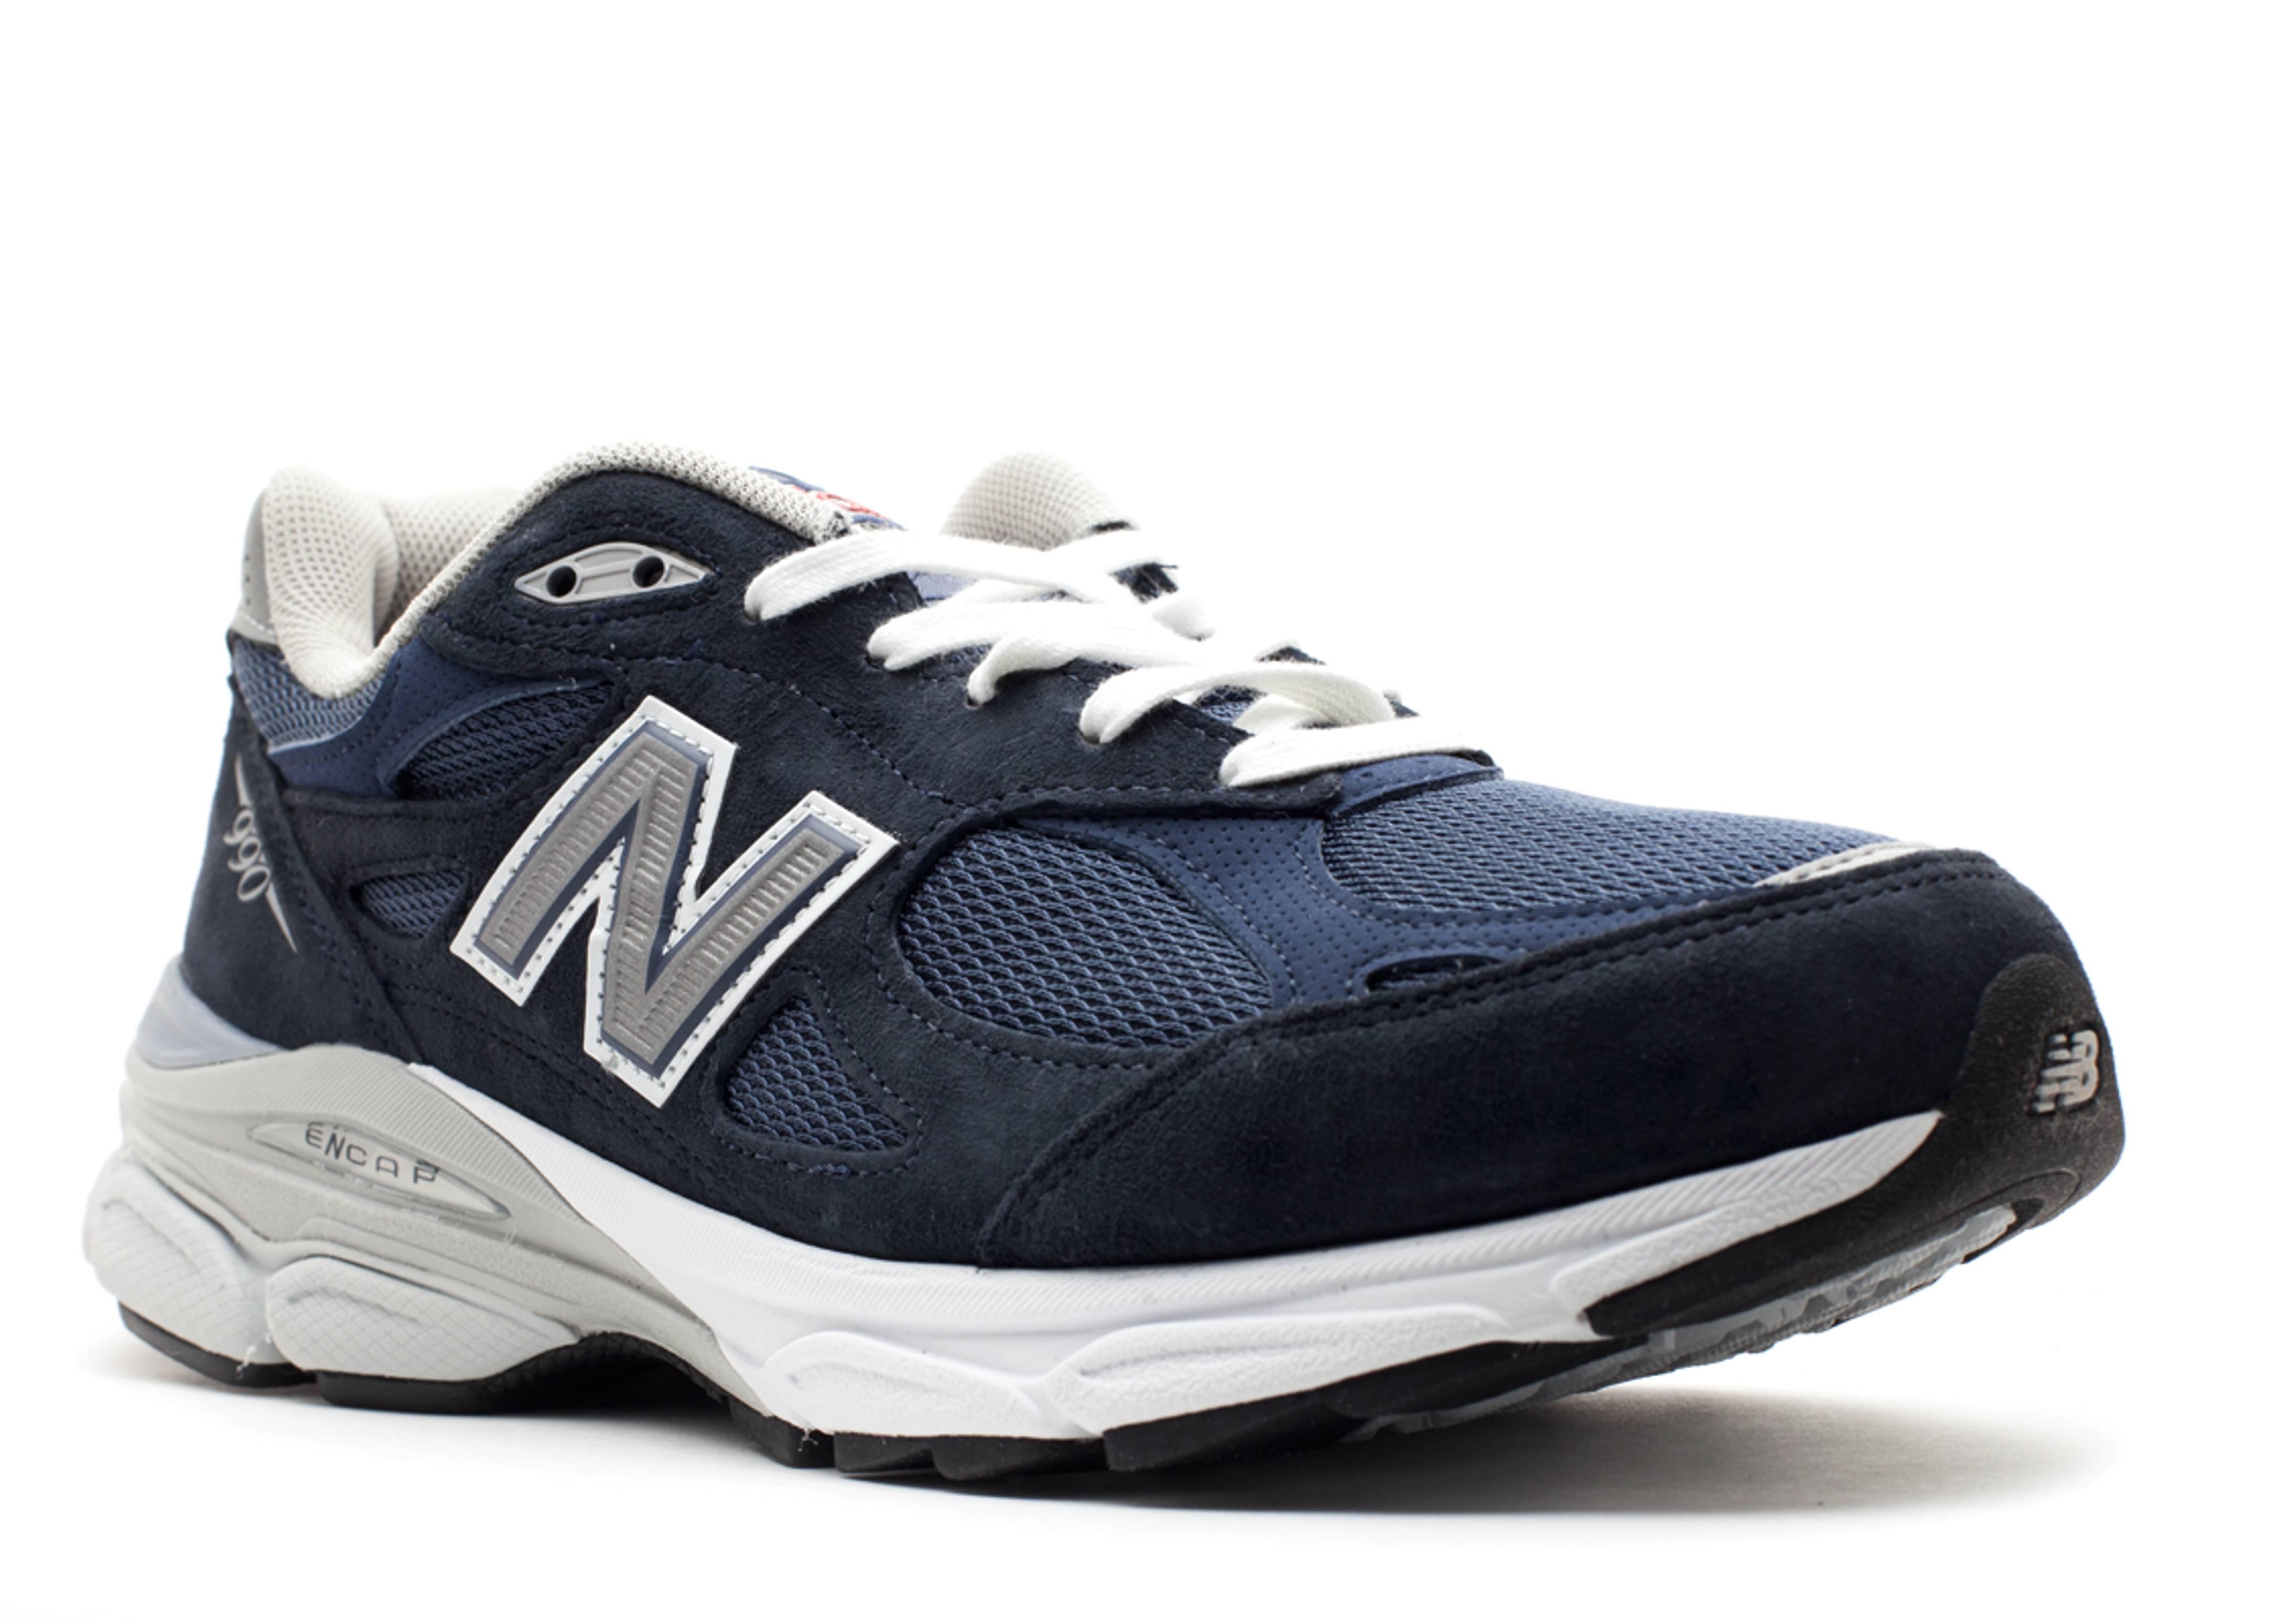 best sneakers 70e4a 97002 M990 - New Balance - m990nv3 - navy/grey/white | Flight Club